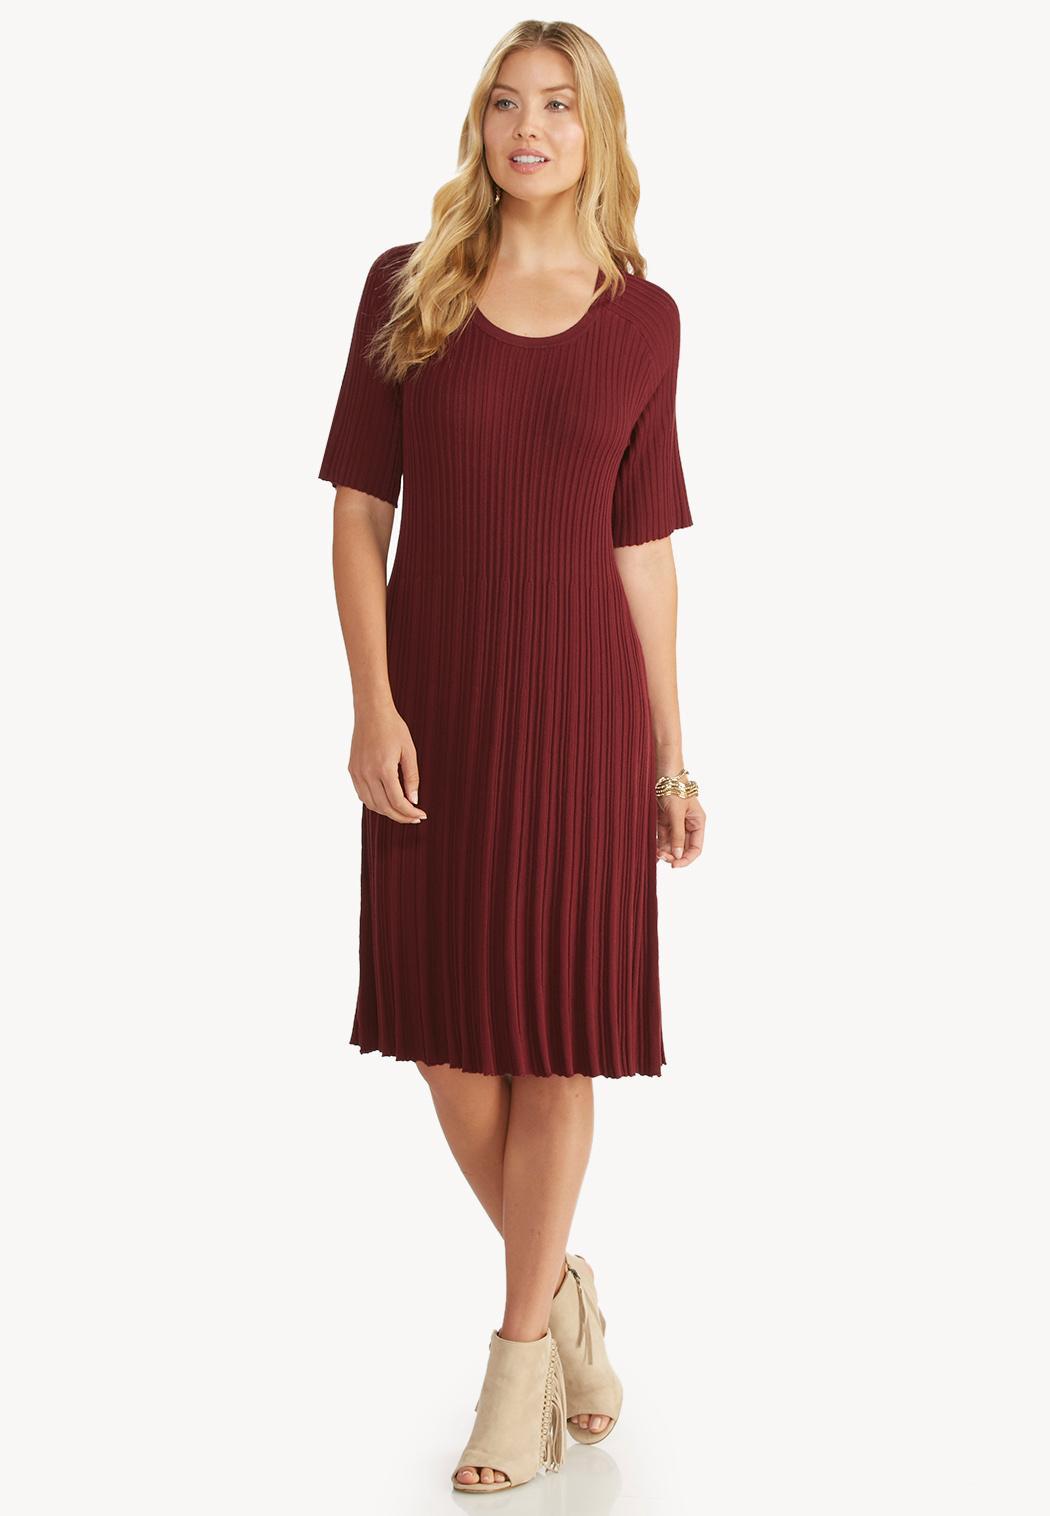 Cato Fashions Plus Size Dresses